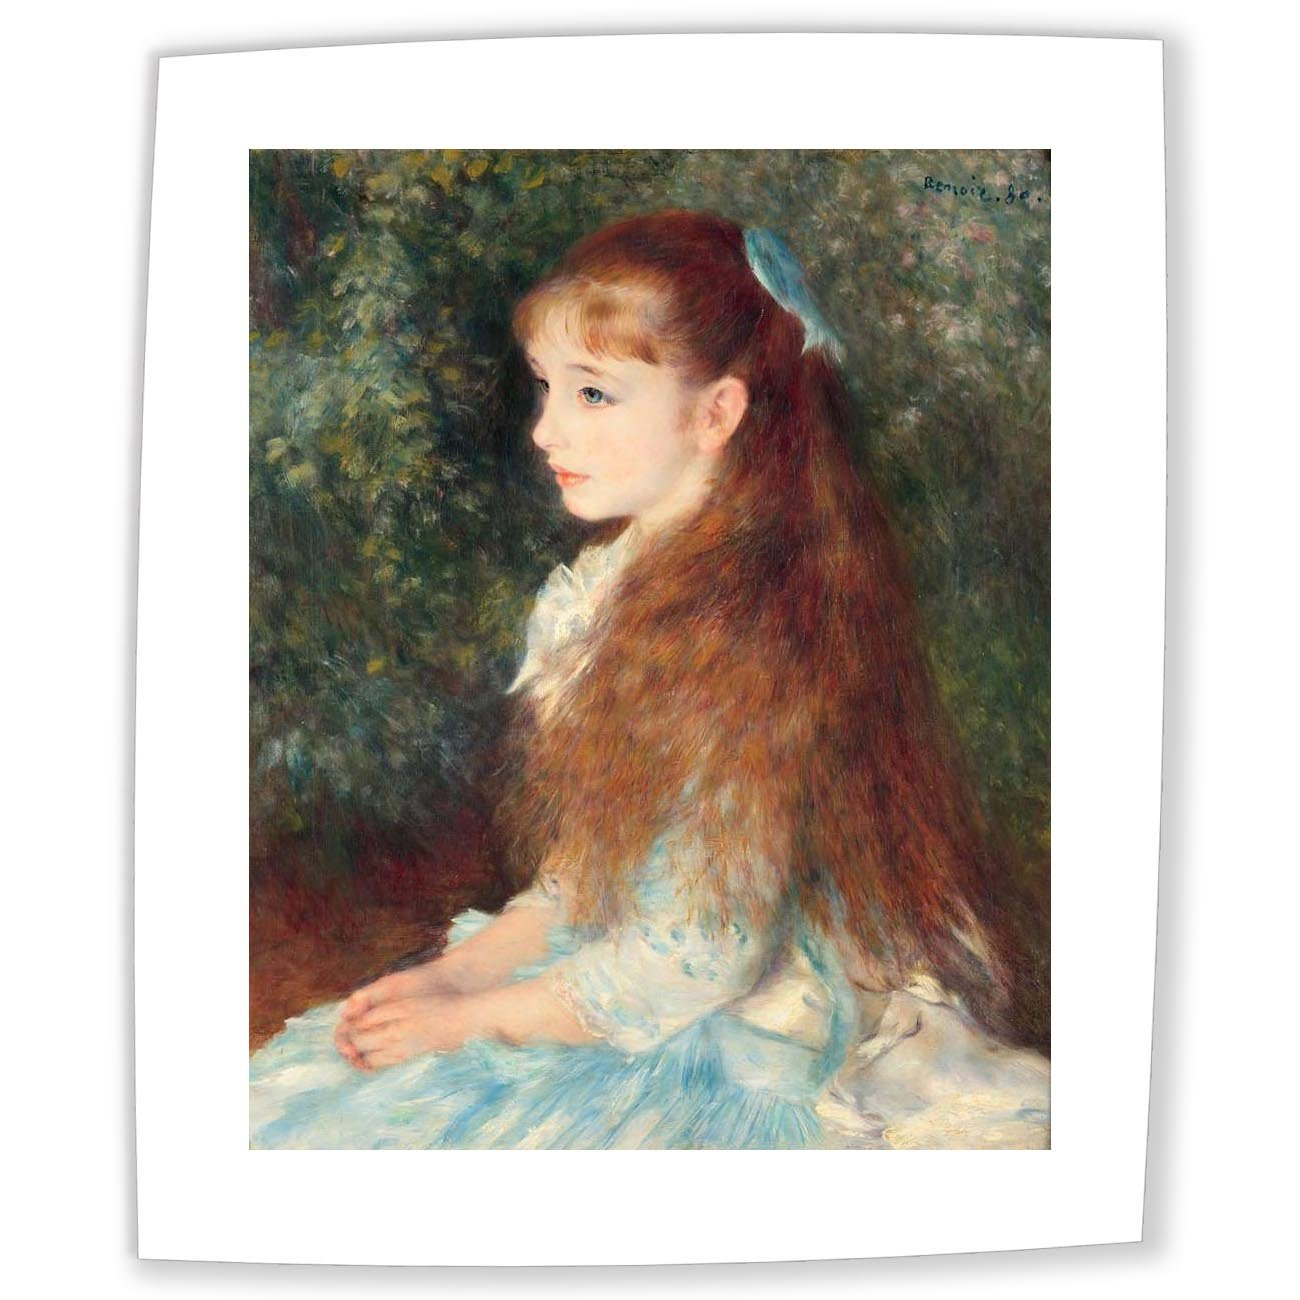 Pierre-Auguste Renoir 印象派 キャンバス 油絵 イレーヌカーンダンヴェール嬢の肖像Portrait of Mademoiselle Irene Cahen d'Anvers 1880 肖像複製画 木枠なし 50X60cm 完全に立体に複製 3D 印刷 美術品 部屋 壁飾り B07CZZT2HRPortrait of Mademoiselle Irene Cahen d'Anvers 1880 50X60 cm (approx. 20X24 inch)